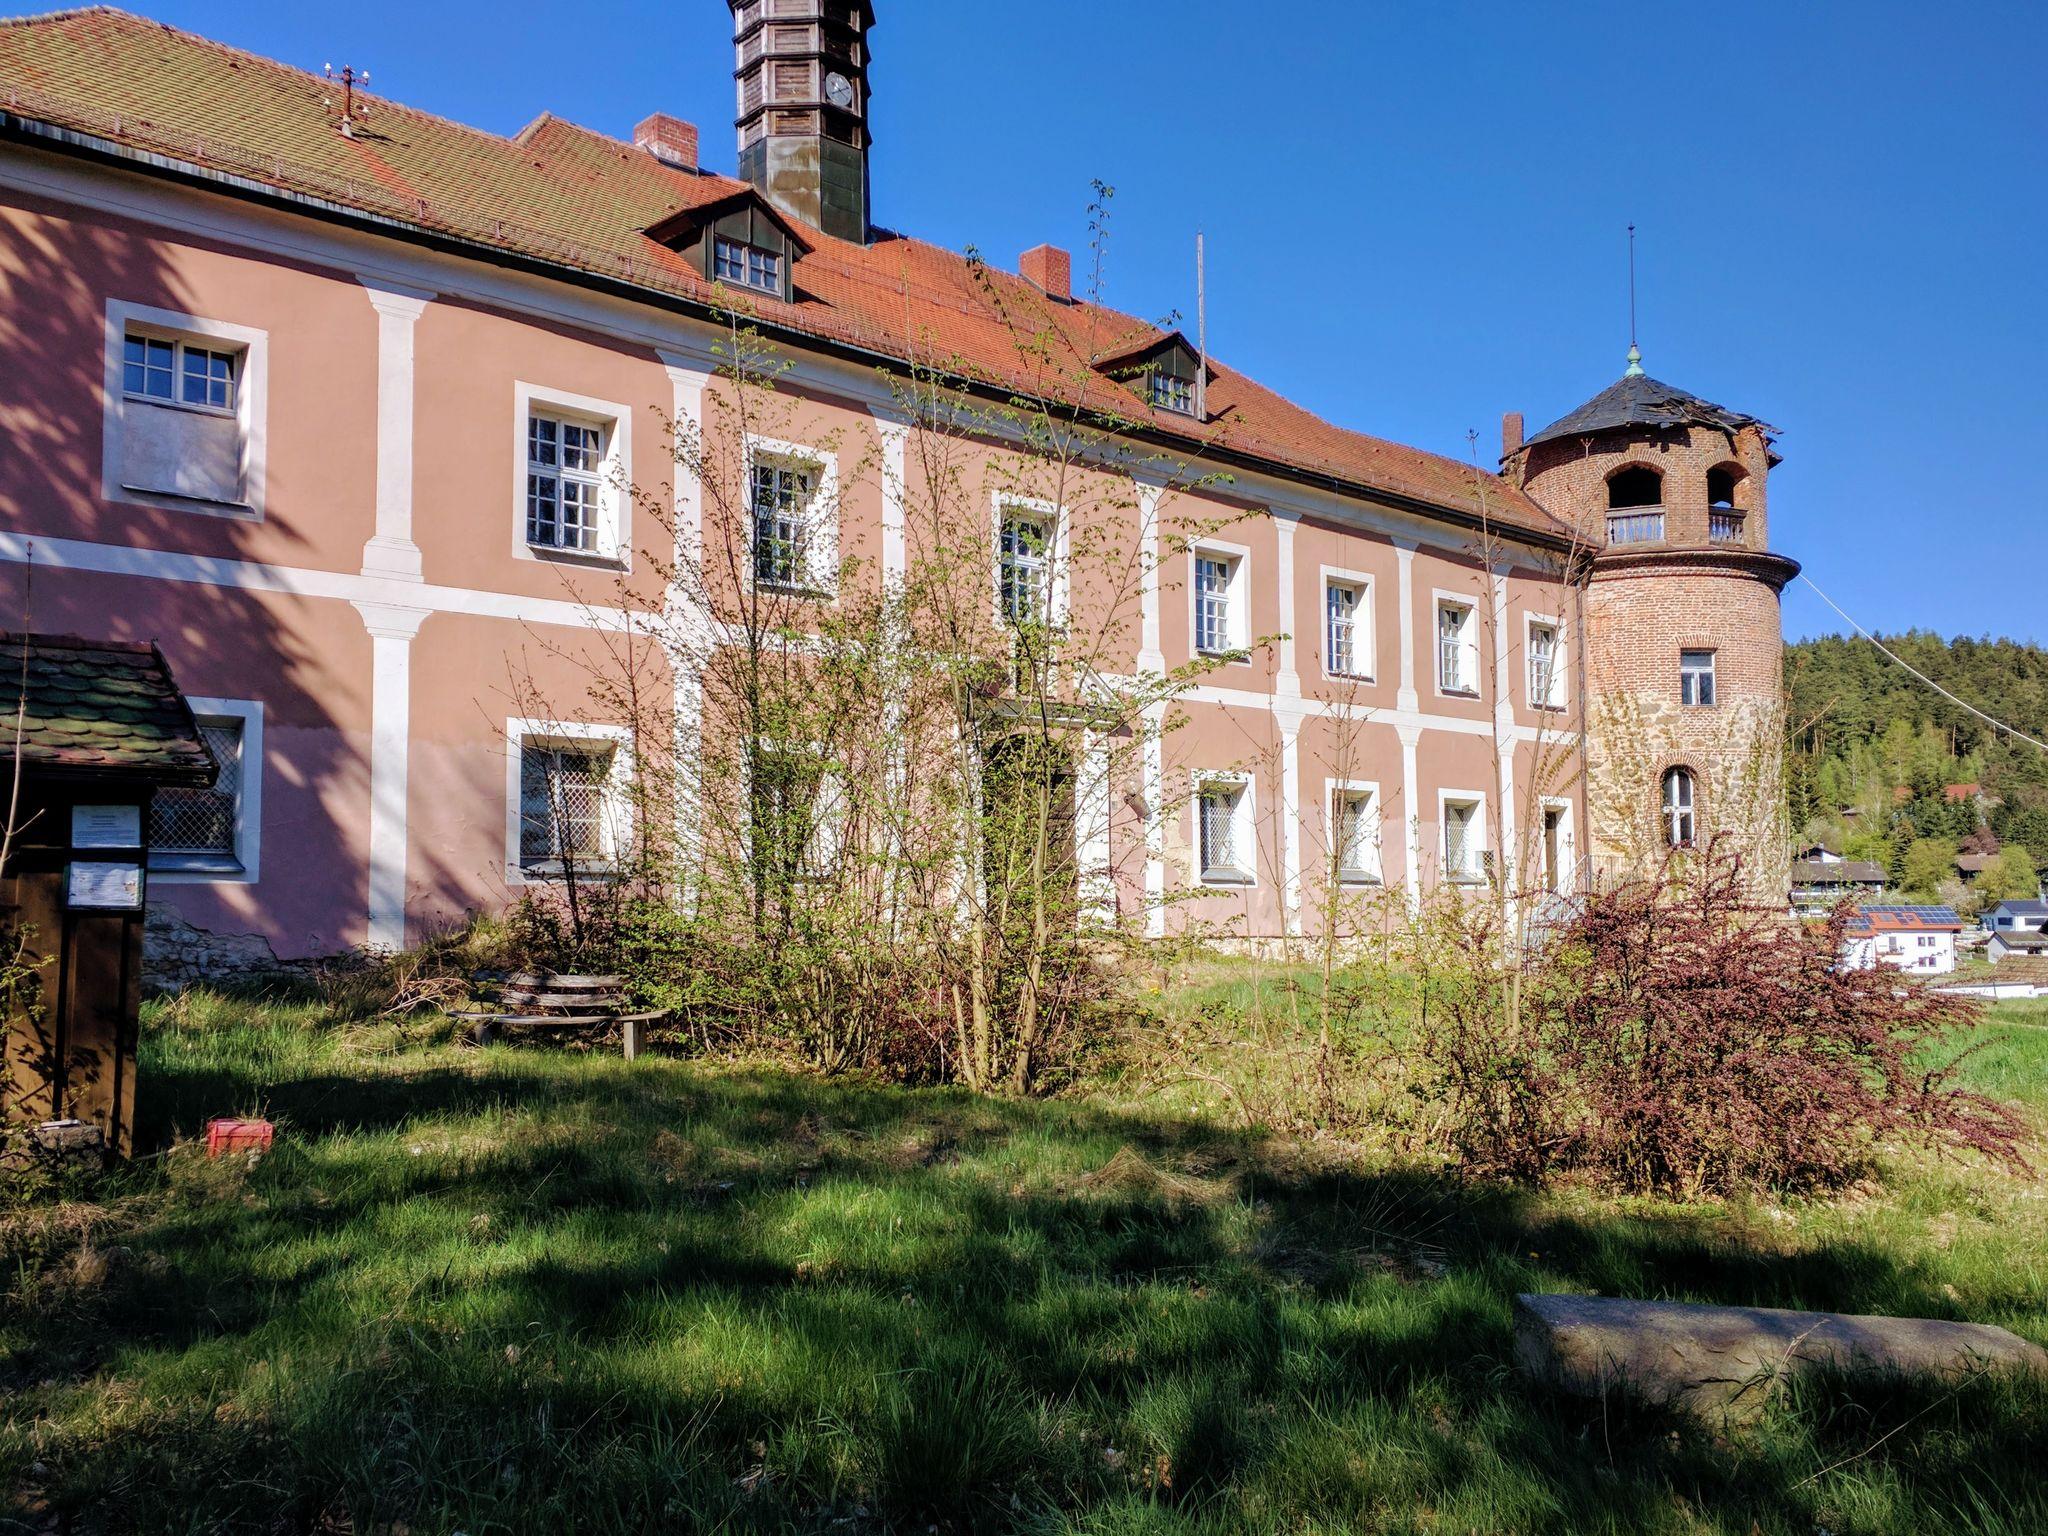 Trans Bayerwald - Verfallendes Schloss in Stamsried